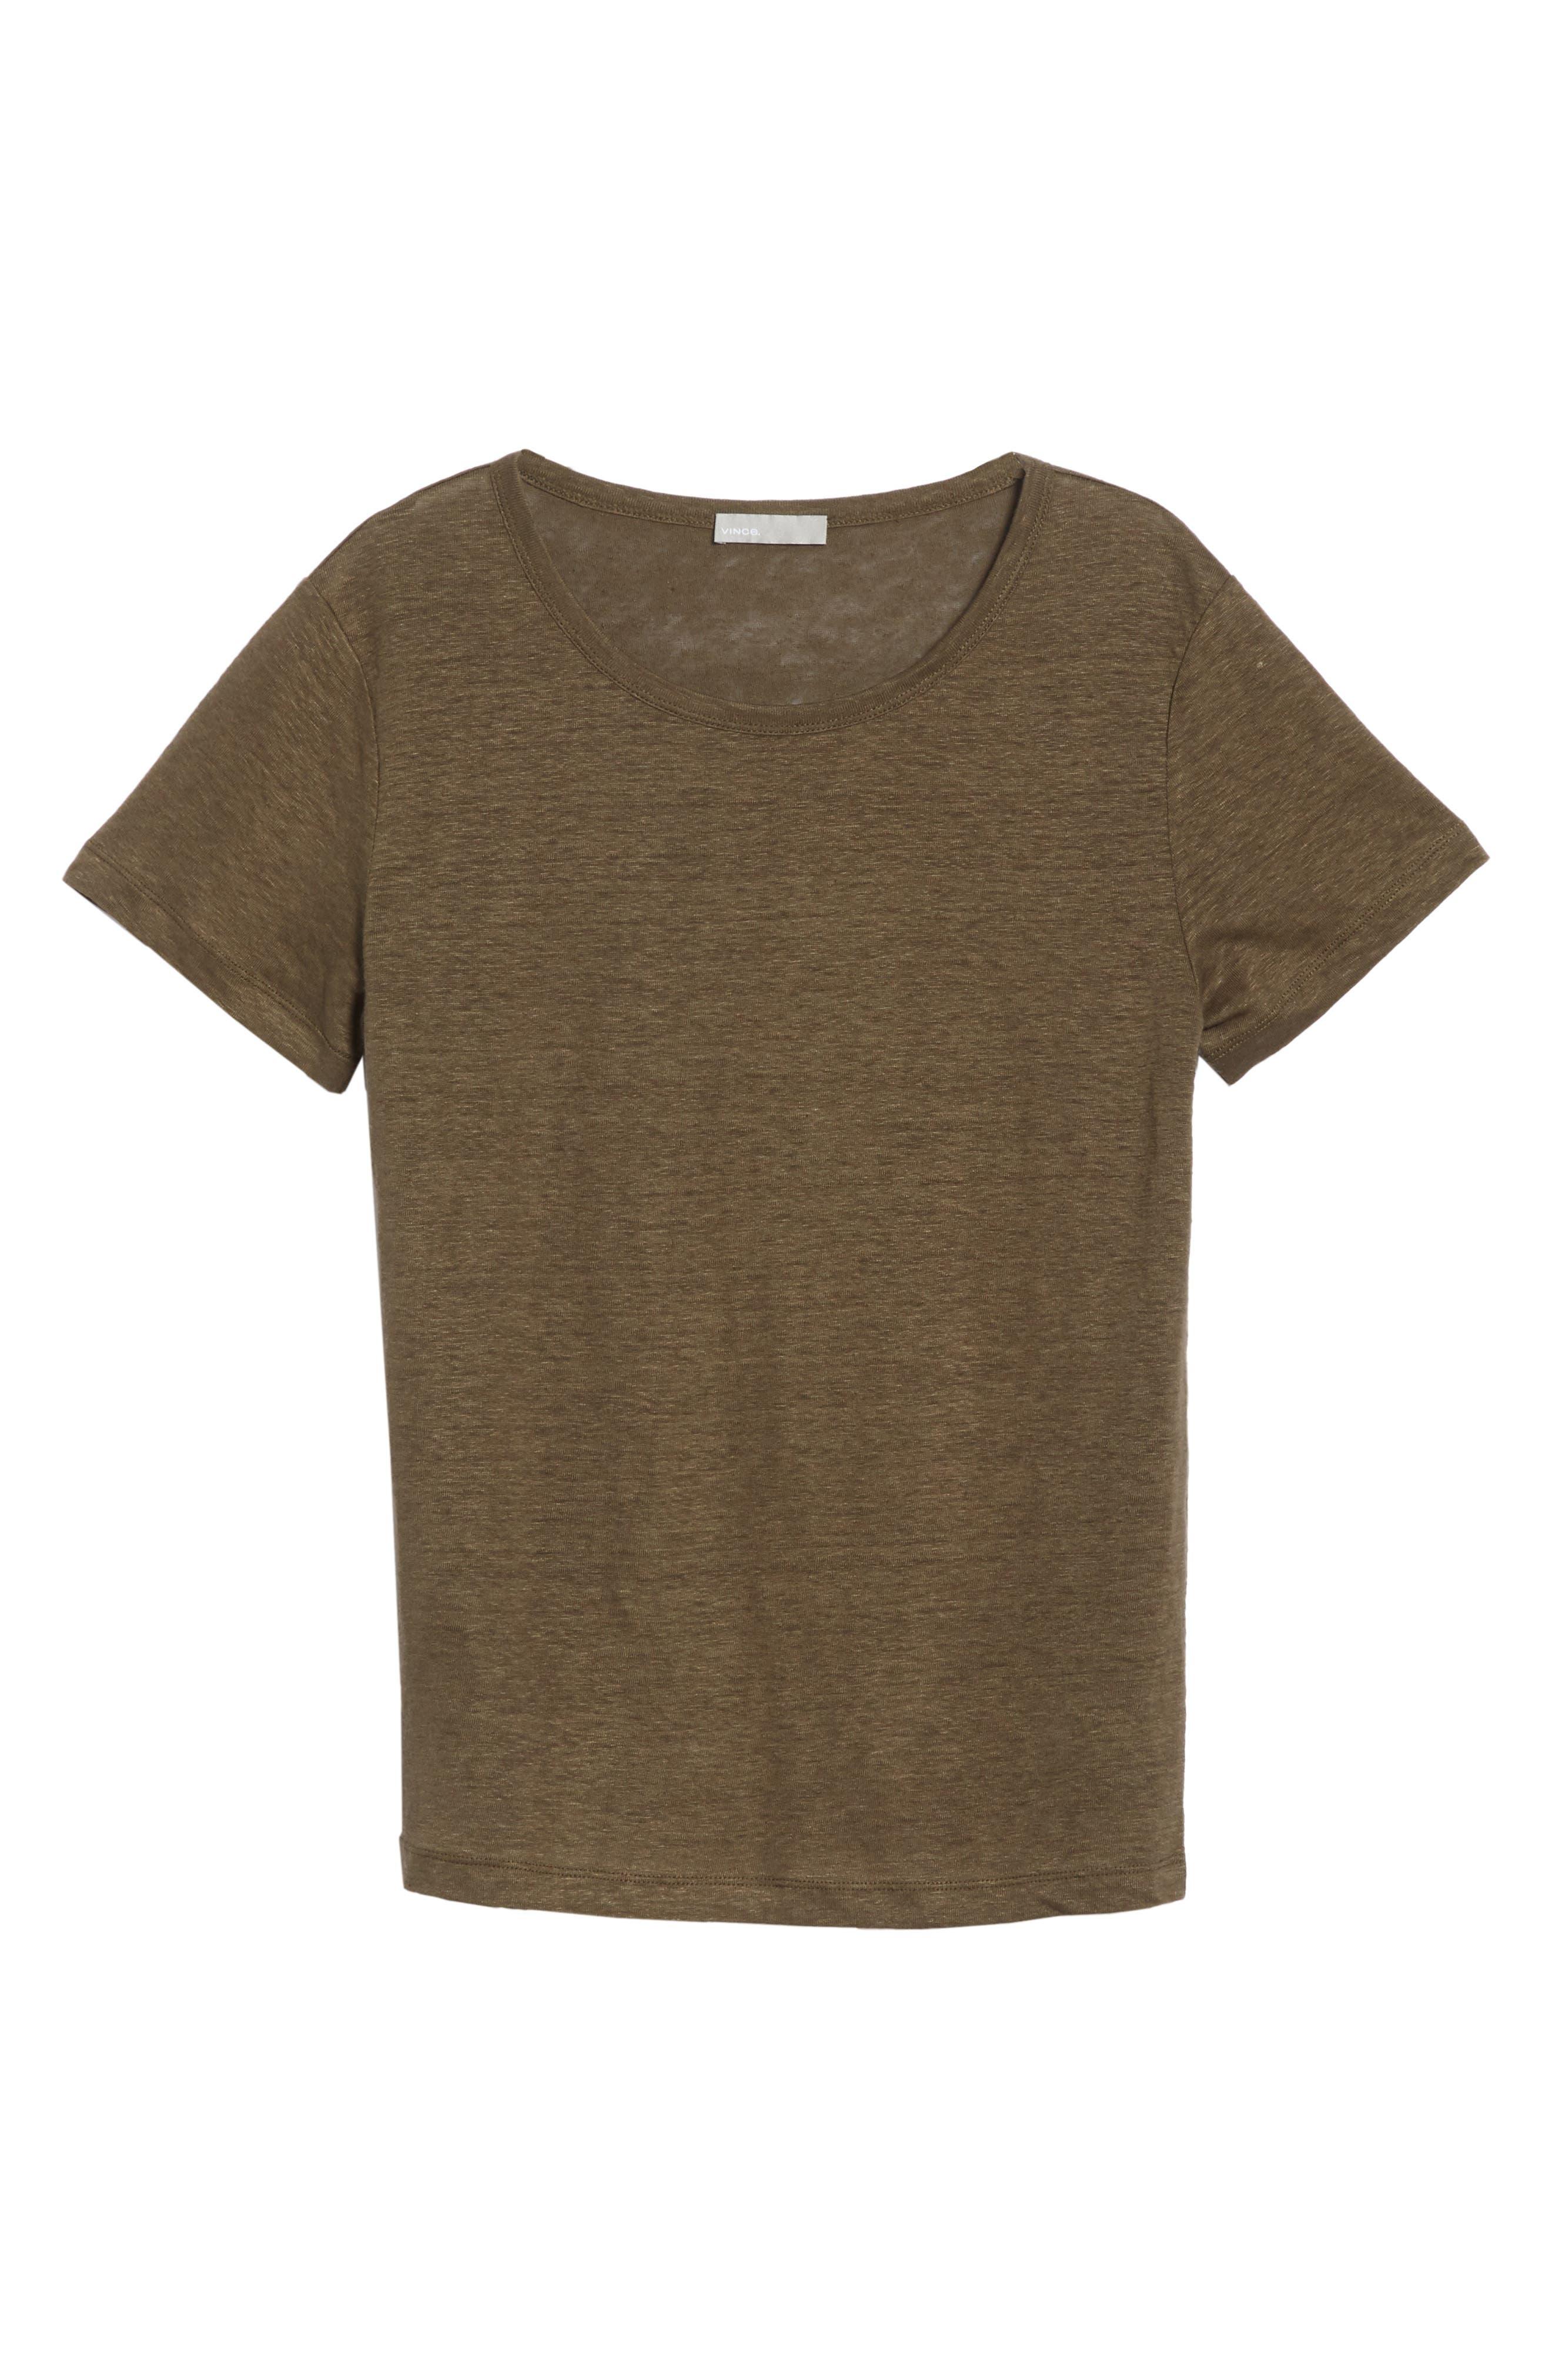 Linen Short Sleeve Top,                             Alternate thumbnail 12, color,